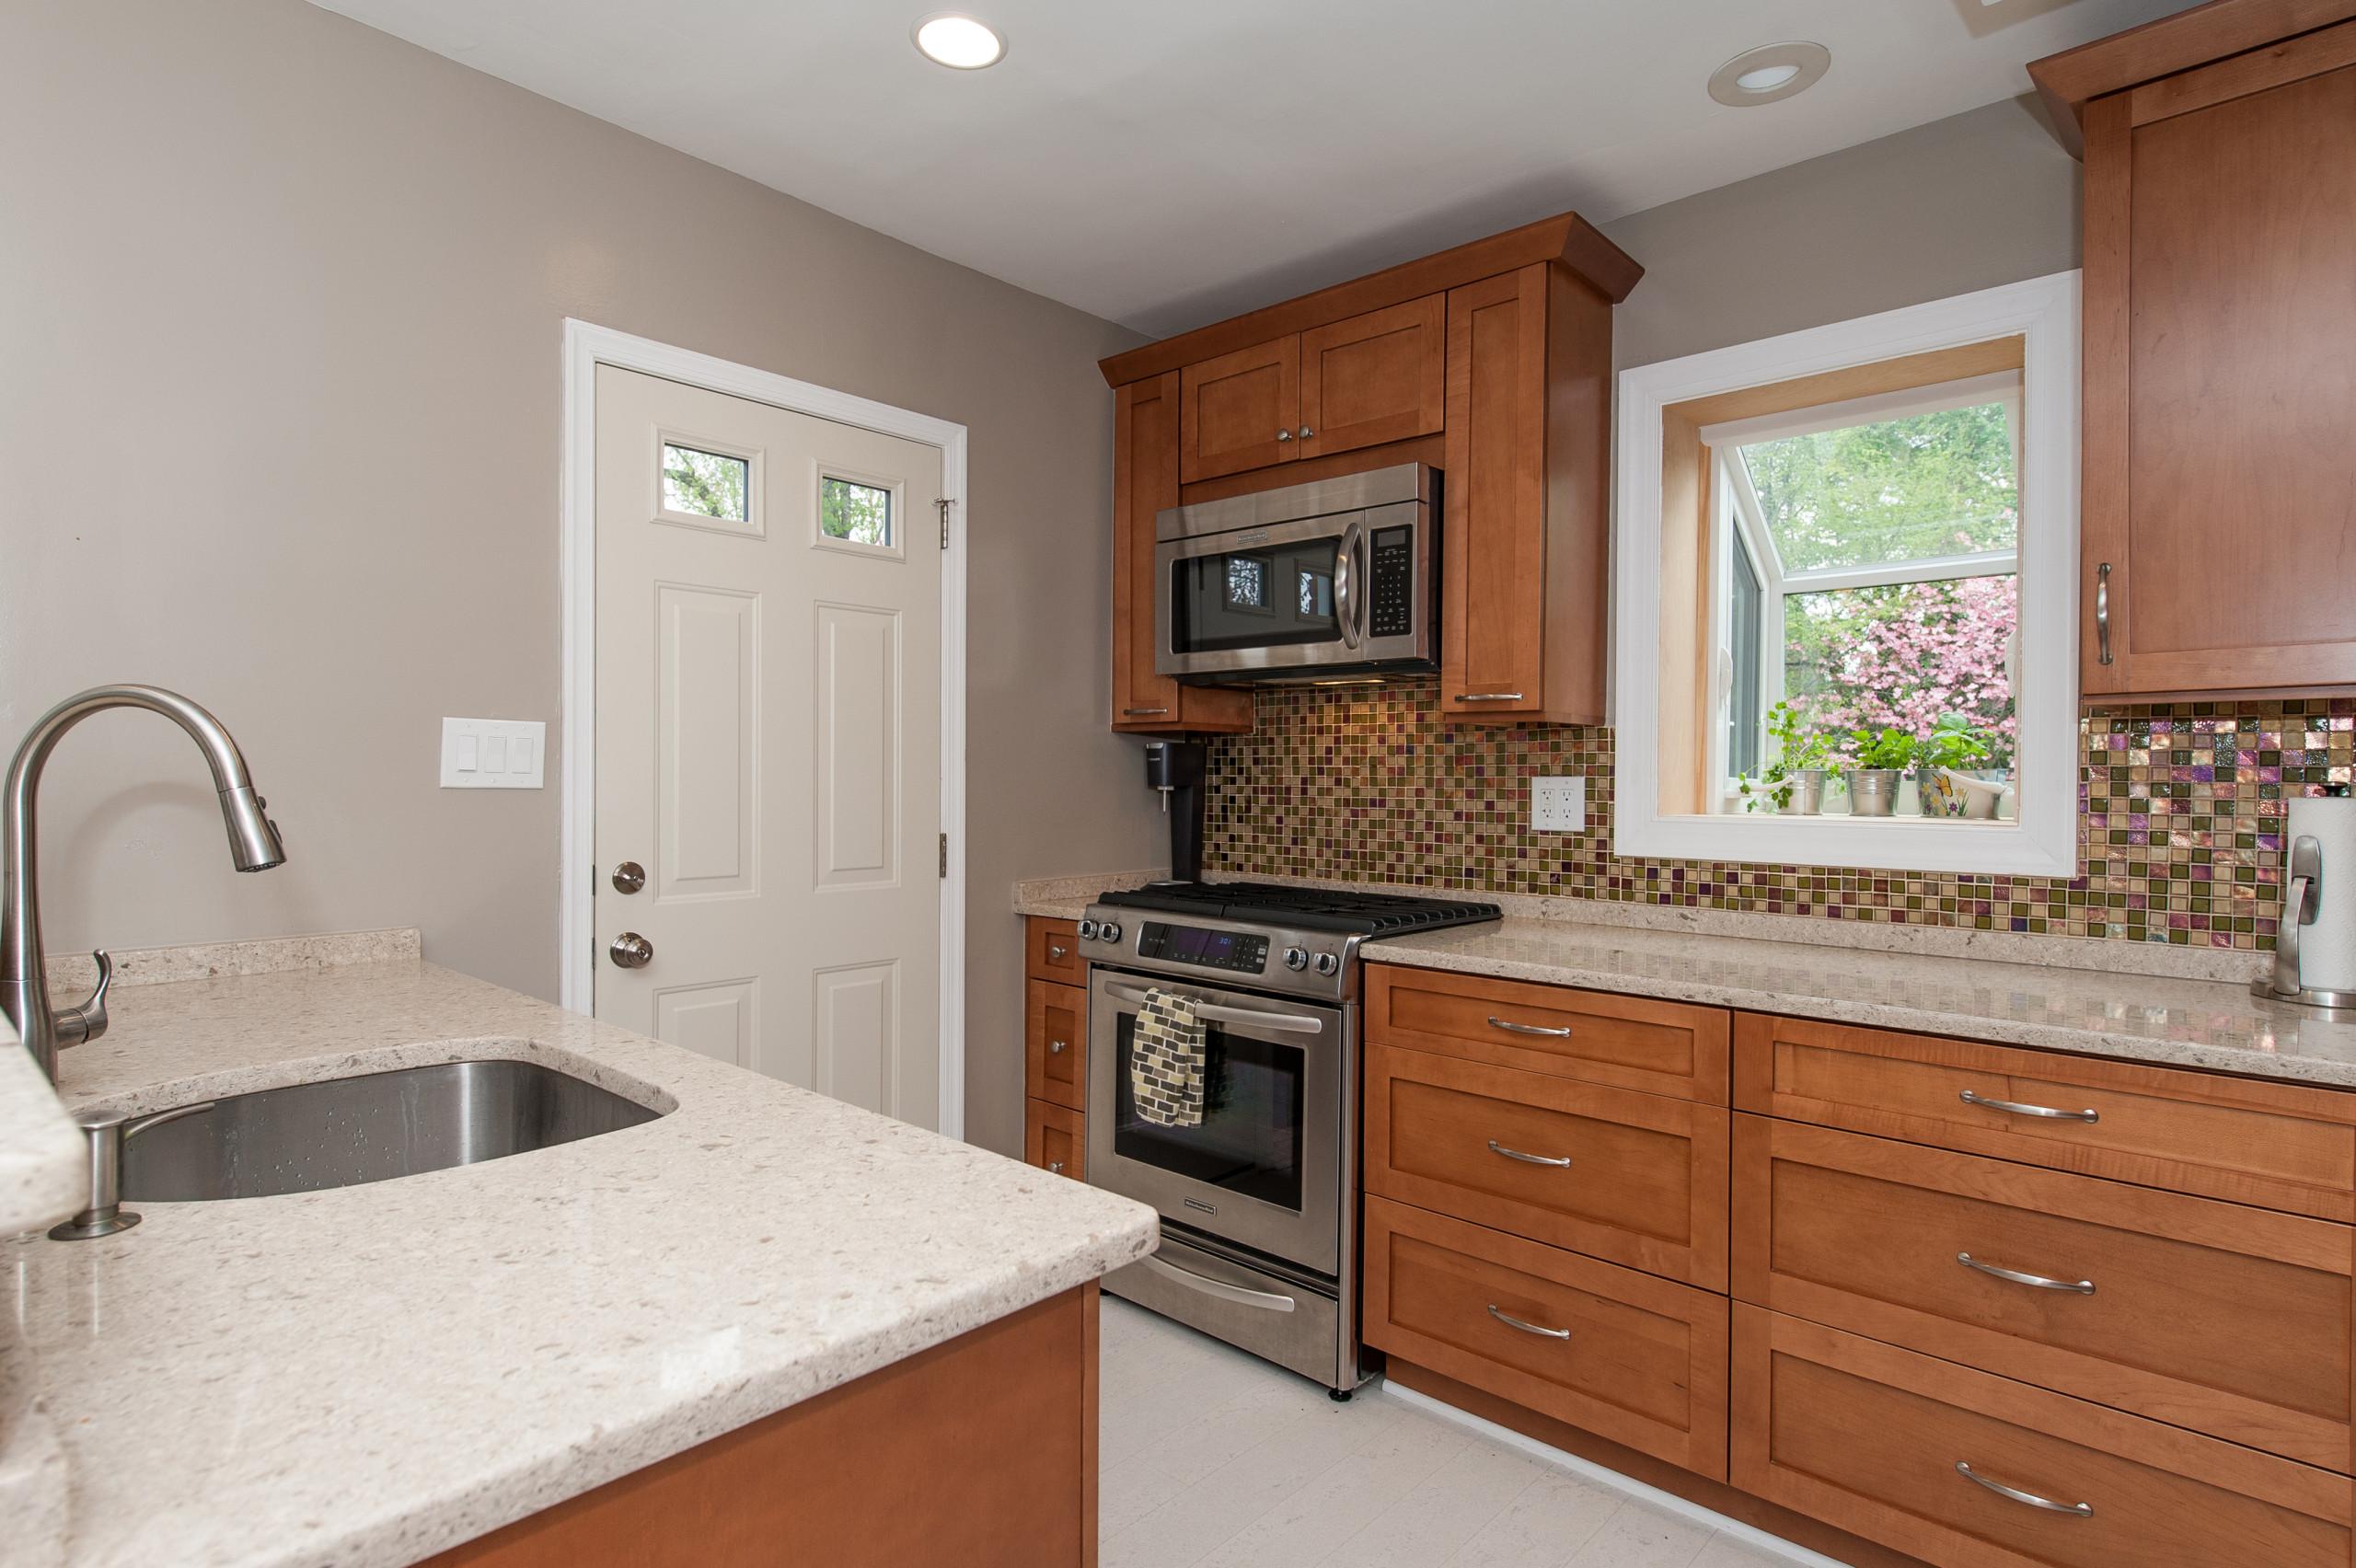 Silver Spring - Transitional Kitchen Remodel